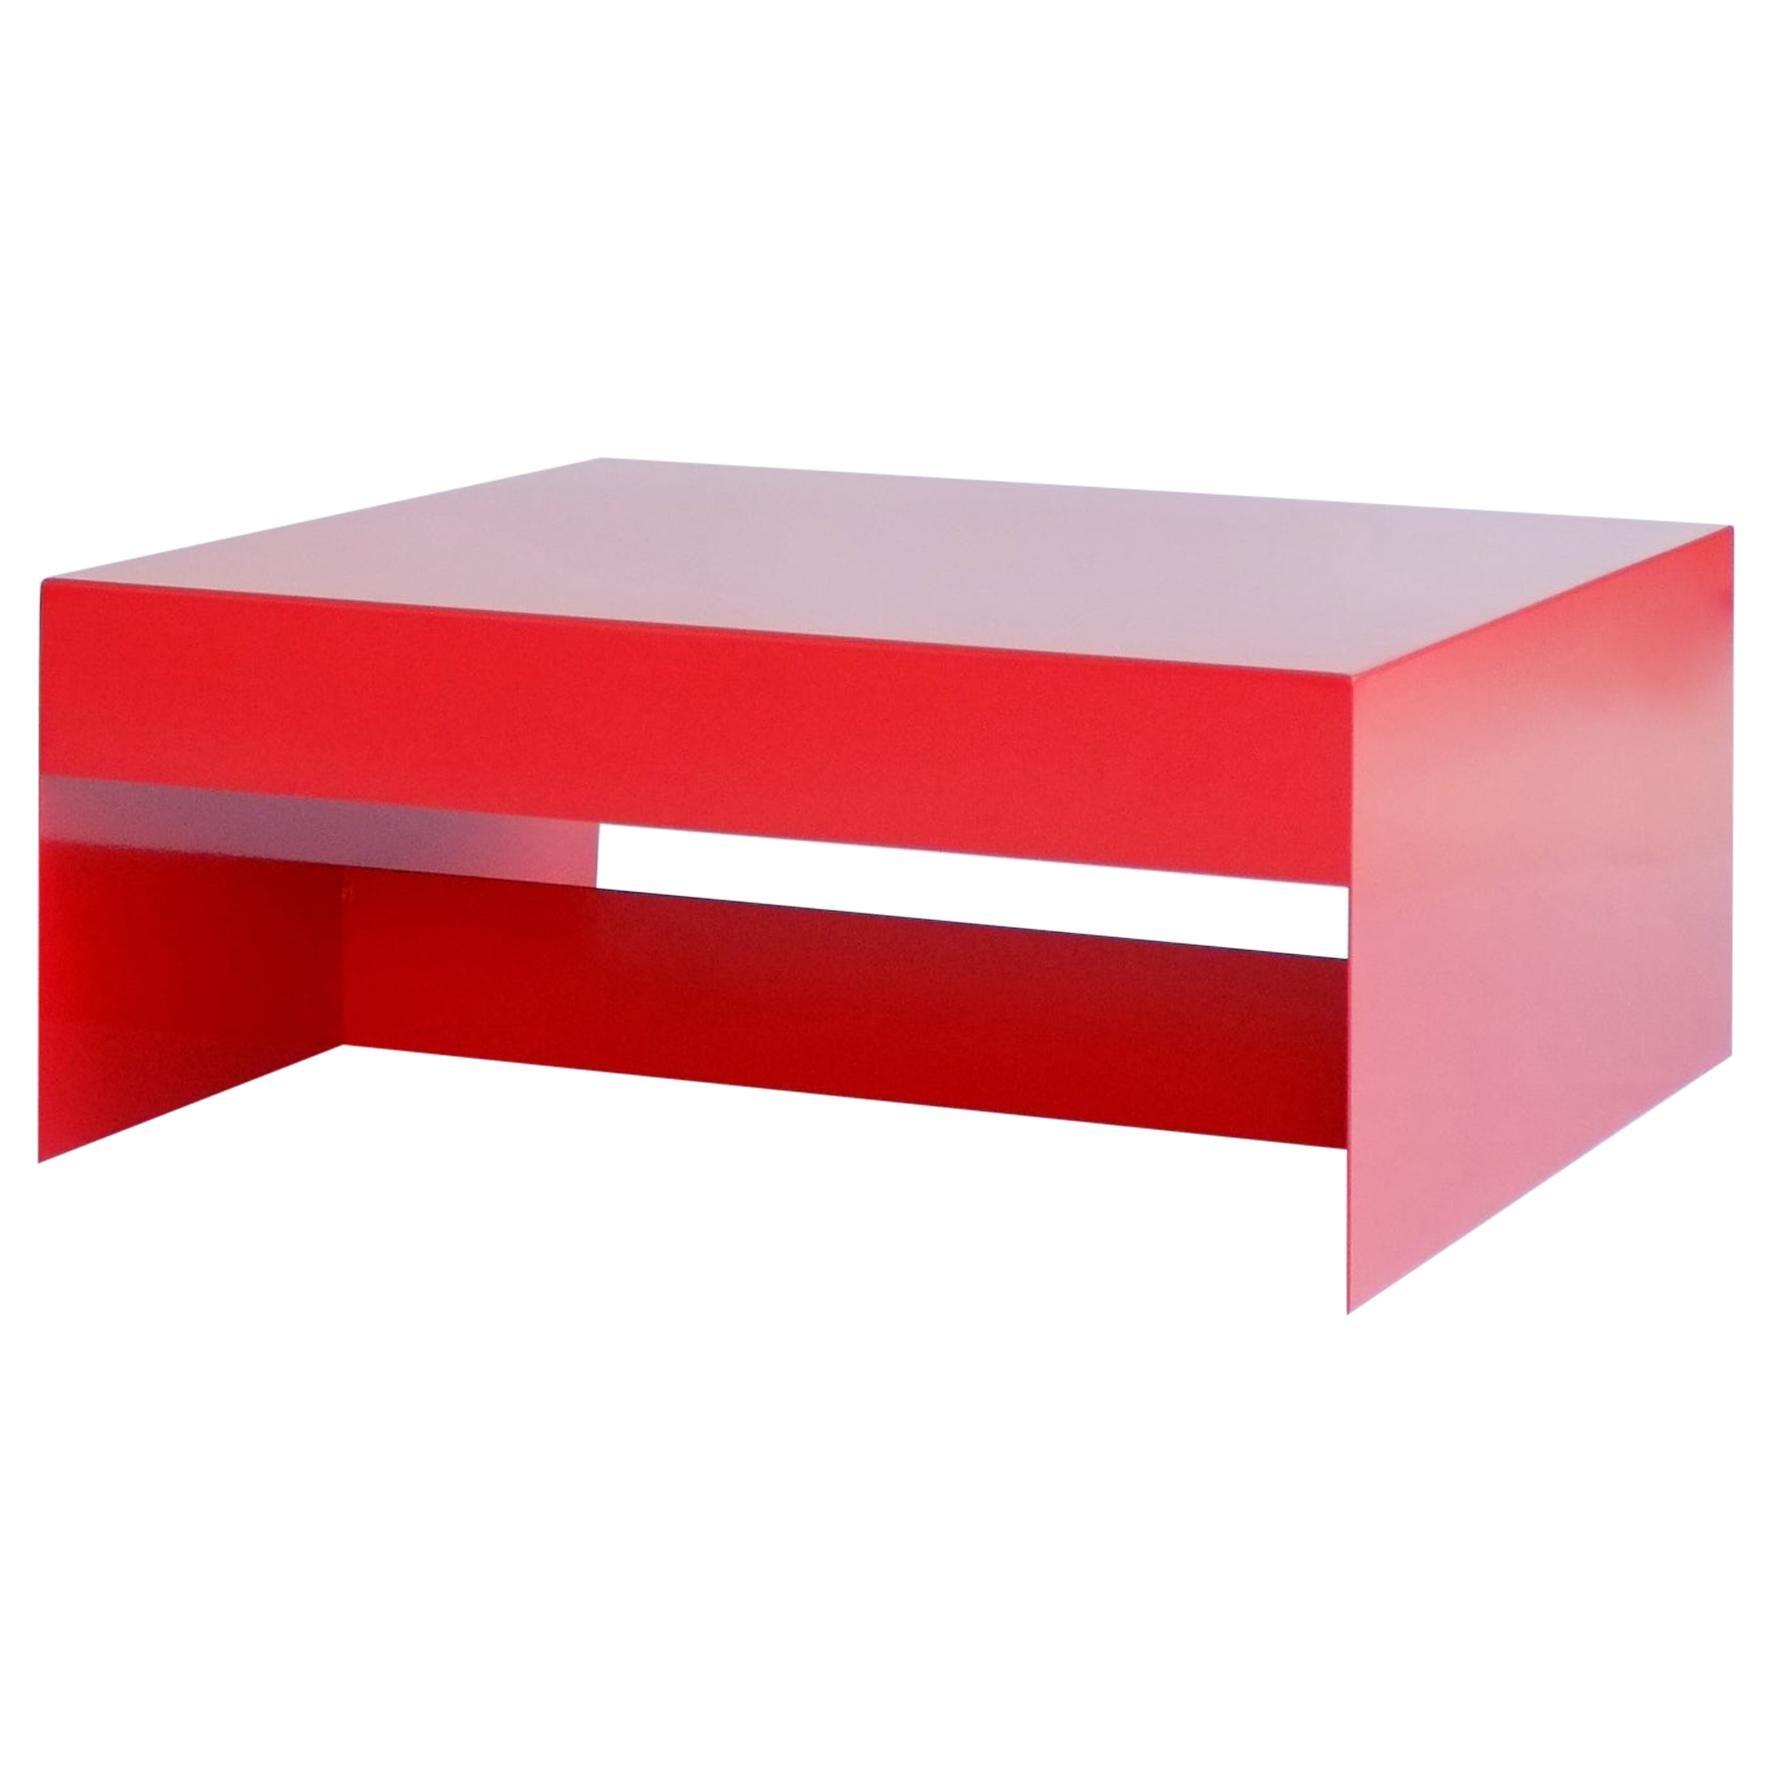 Red Single Form Square Aluminium Coffee Table - Customisable